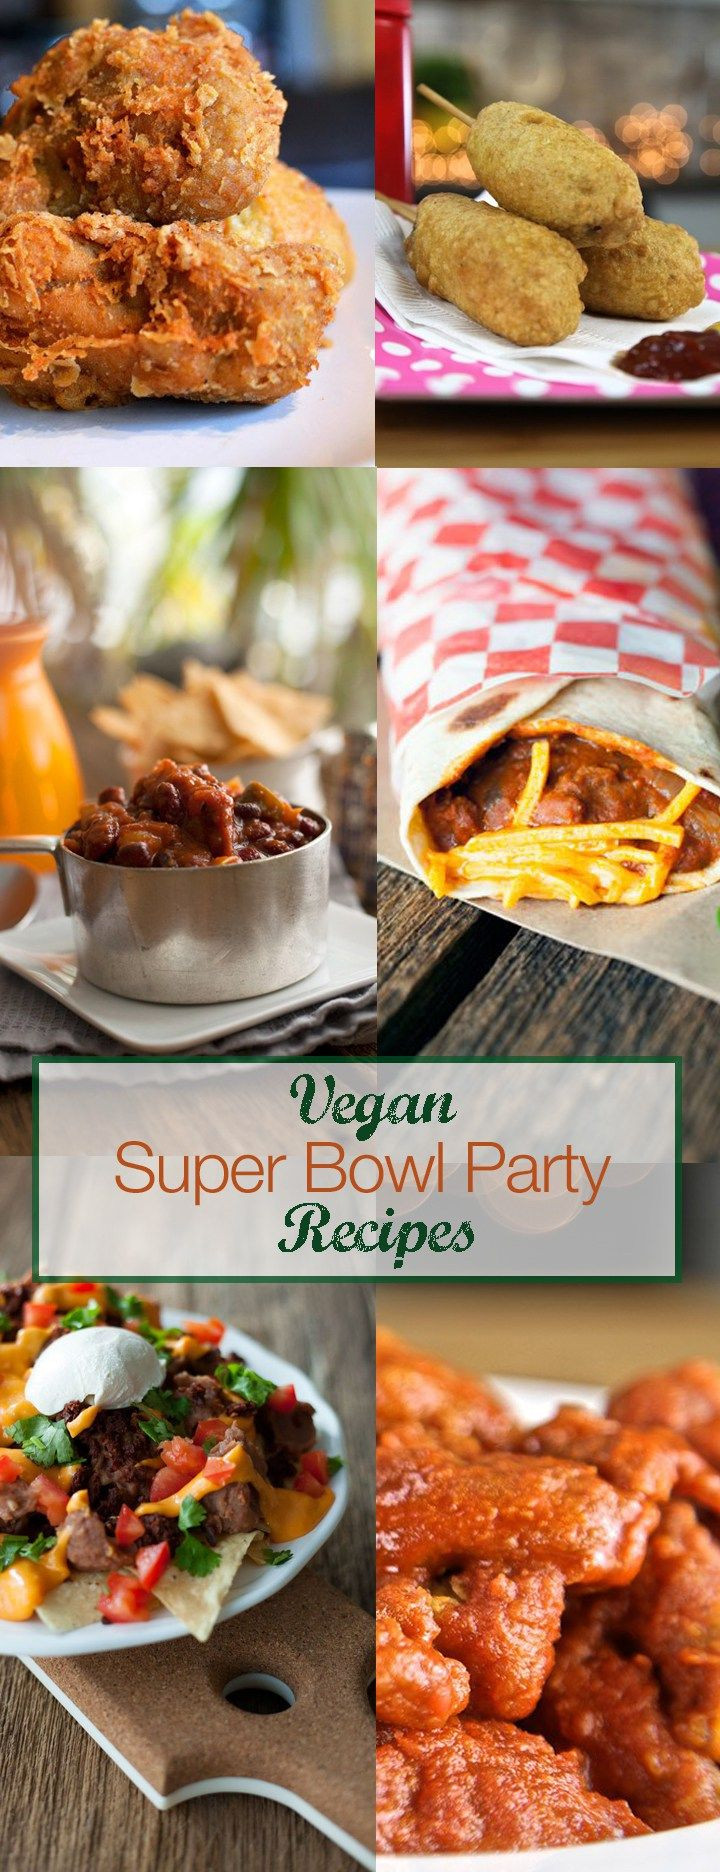 Super Bowl Vegan Recipes  98 best images about Sports on Pinterest